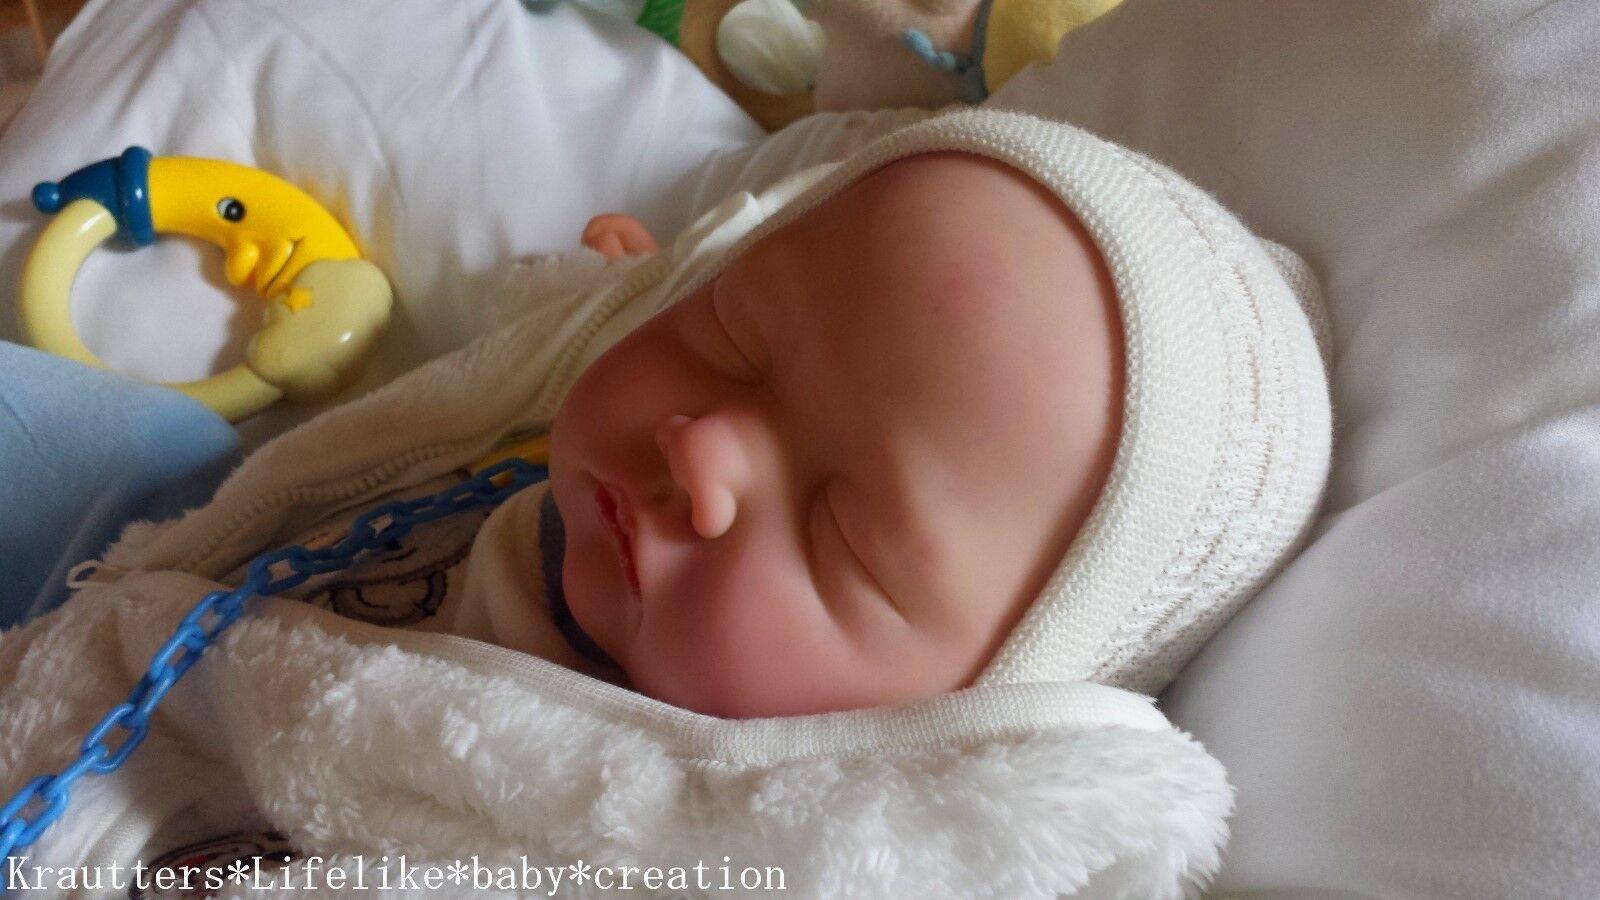 ✨♥Reborn Reallife Baby wie echt ! BS v. U.L Krautter Babypuppe Künstlerpuppe♥✨